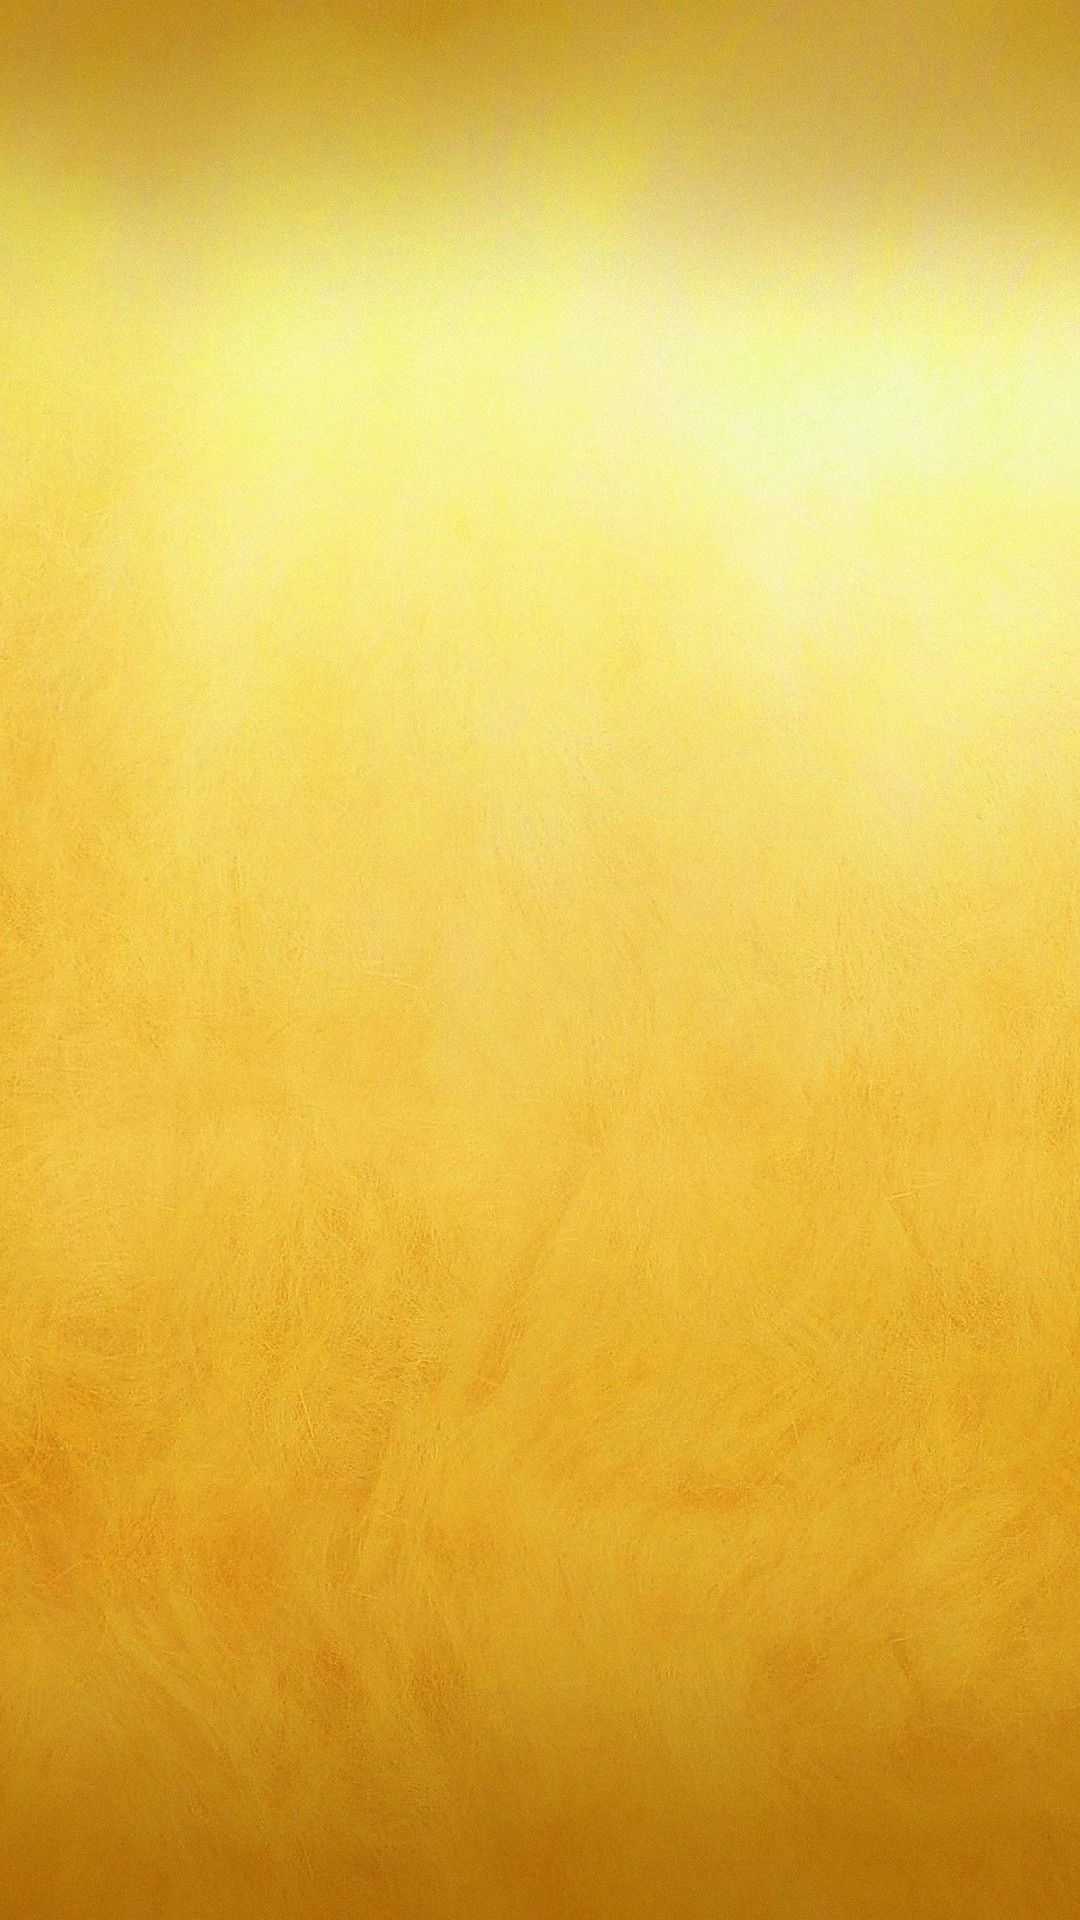 iPhone X Wallpaper Plain Gold | iPhoneWallpapers | Gold wallpaper, Gold wallpaper,roid, Gold ...